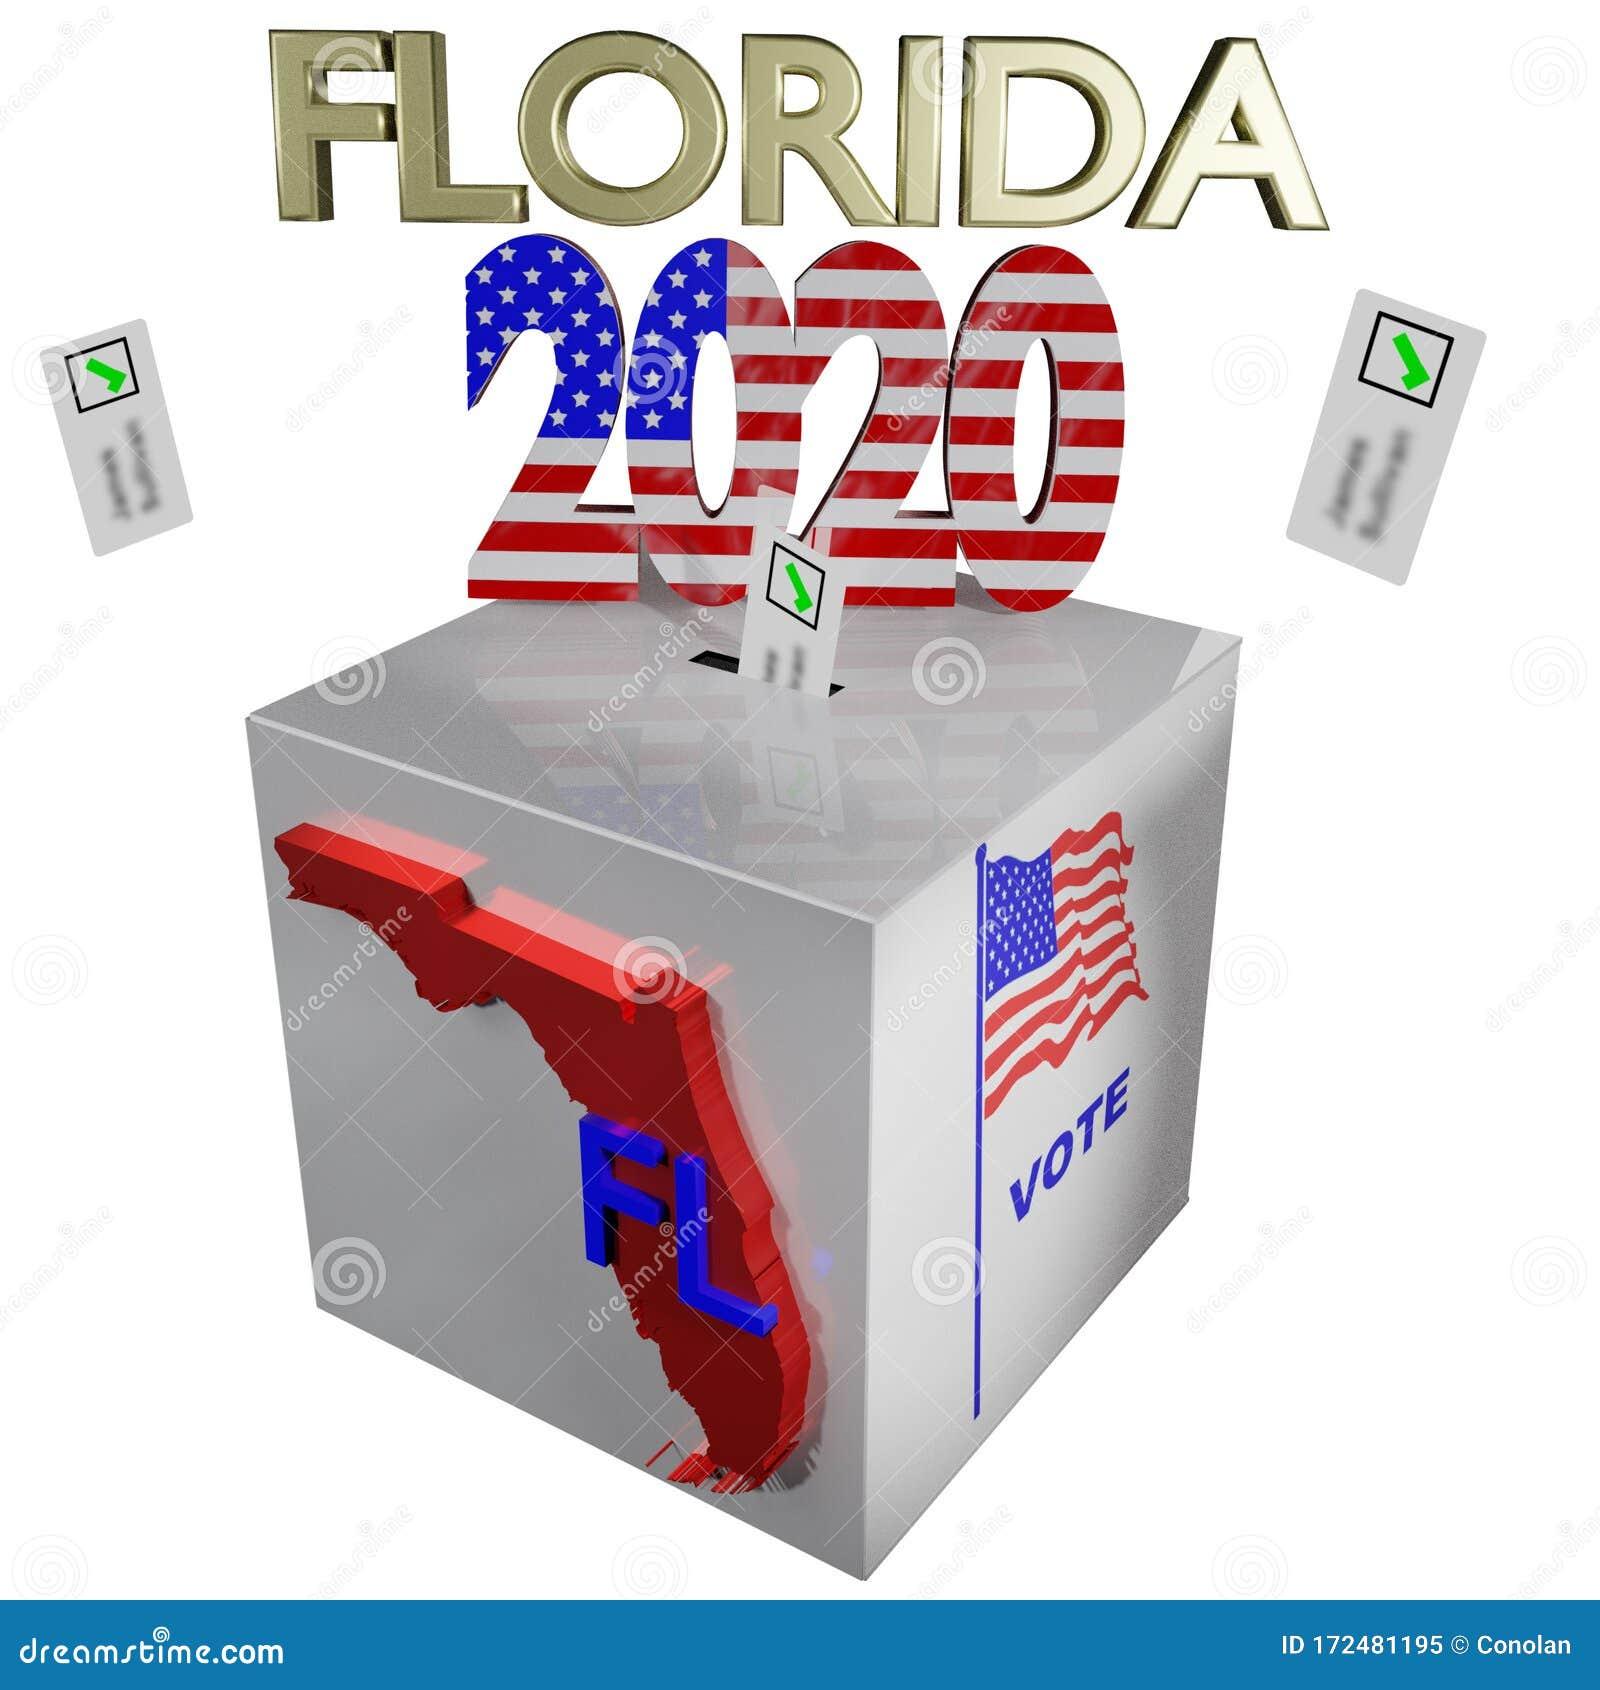 Election 2020 Florida Box 3D Illustration Stock Illustration - Illustration of bloomberg, republican: 172481195